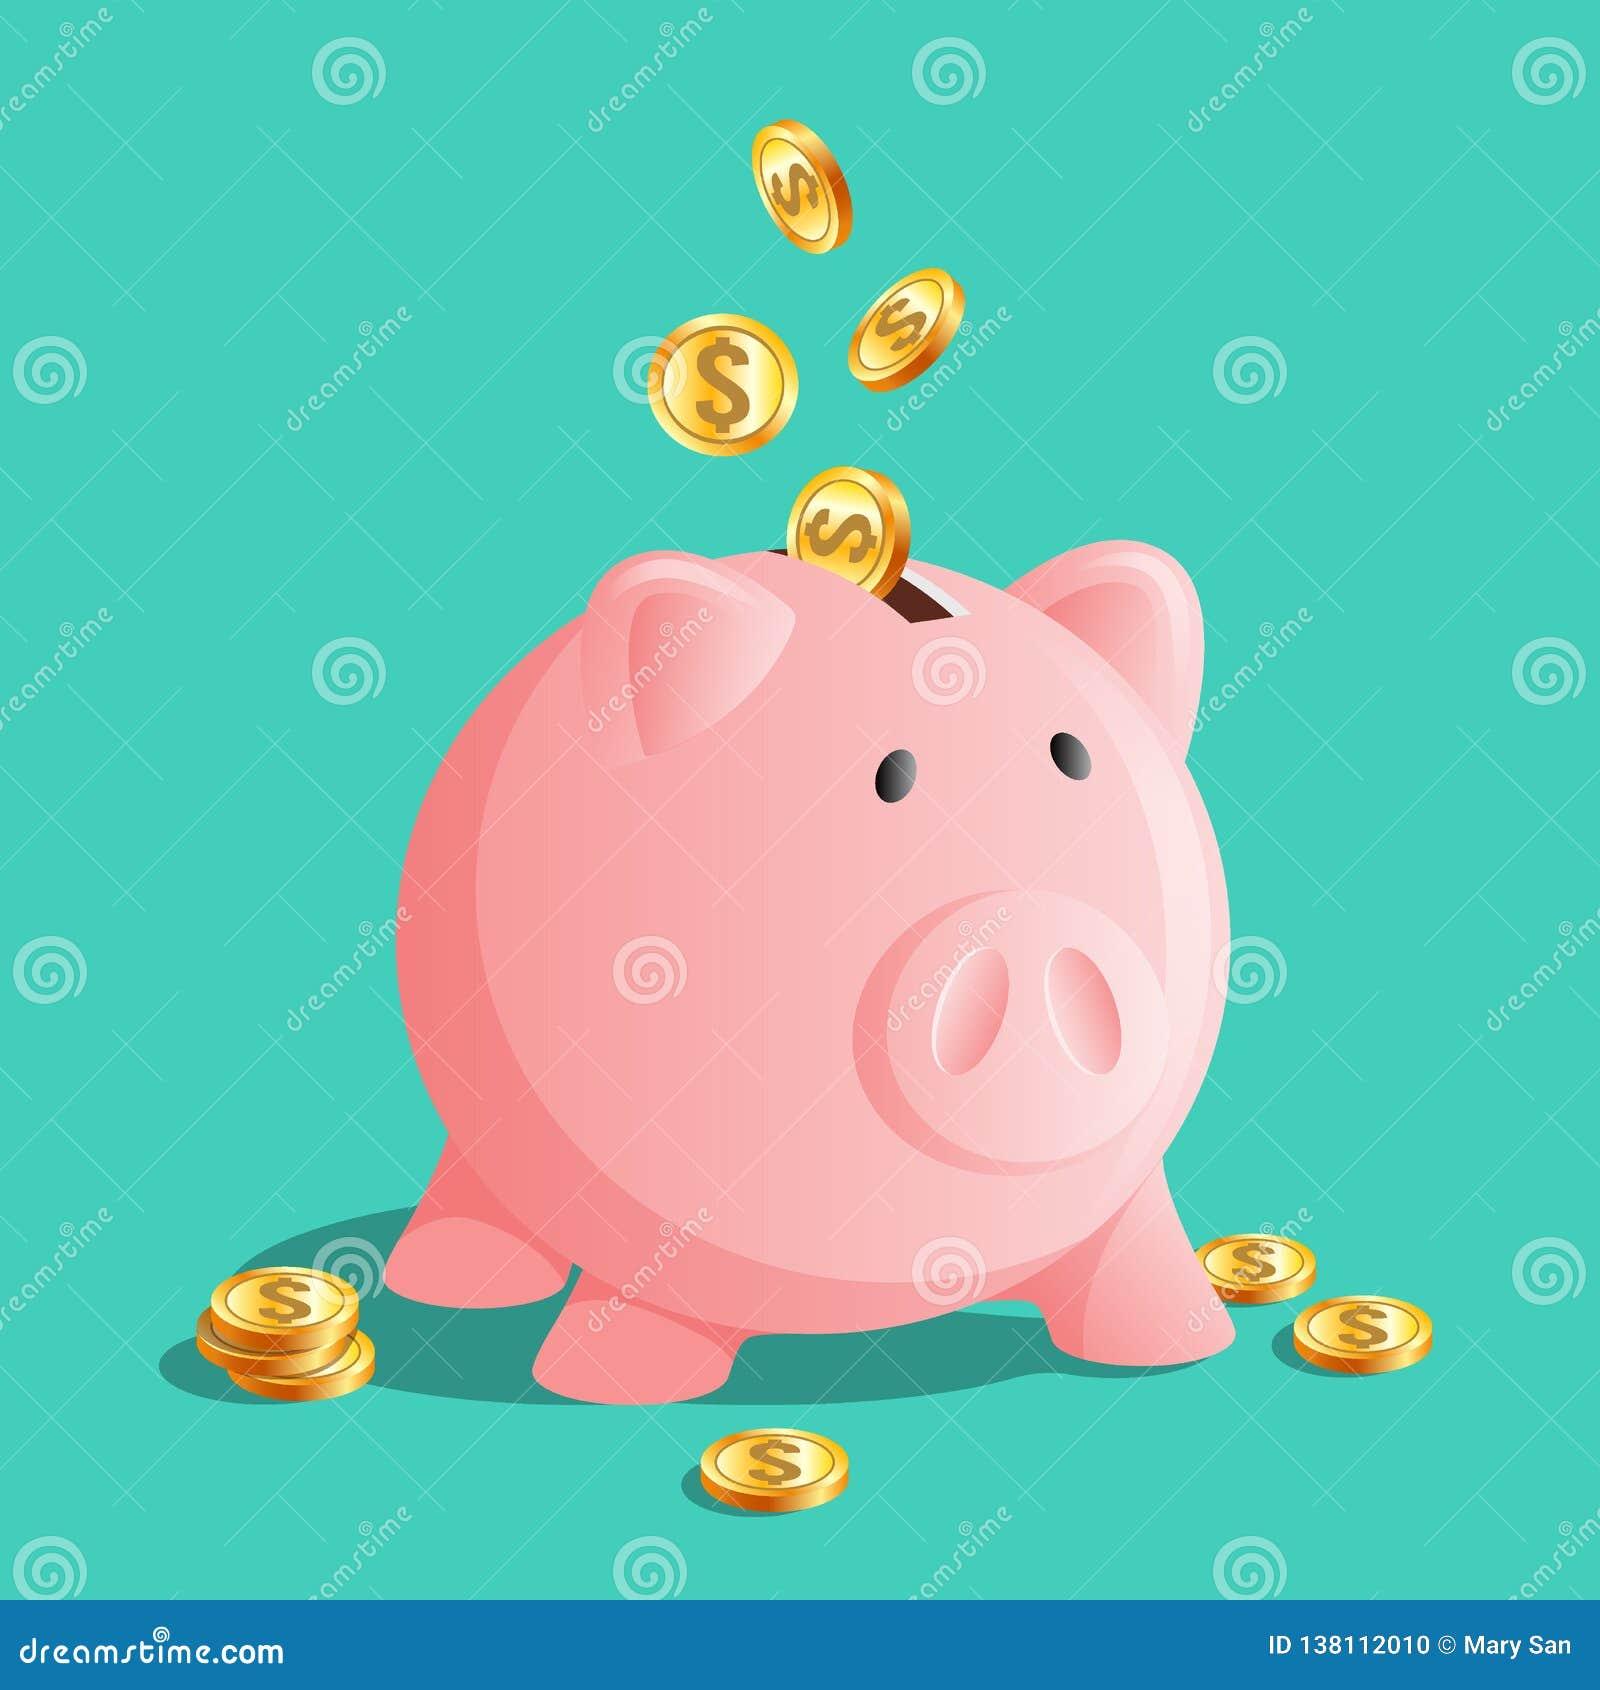 Rosa spargrissymbol, moneybox med kalla mynt